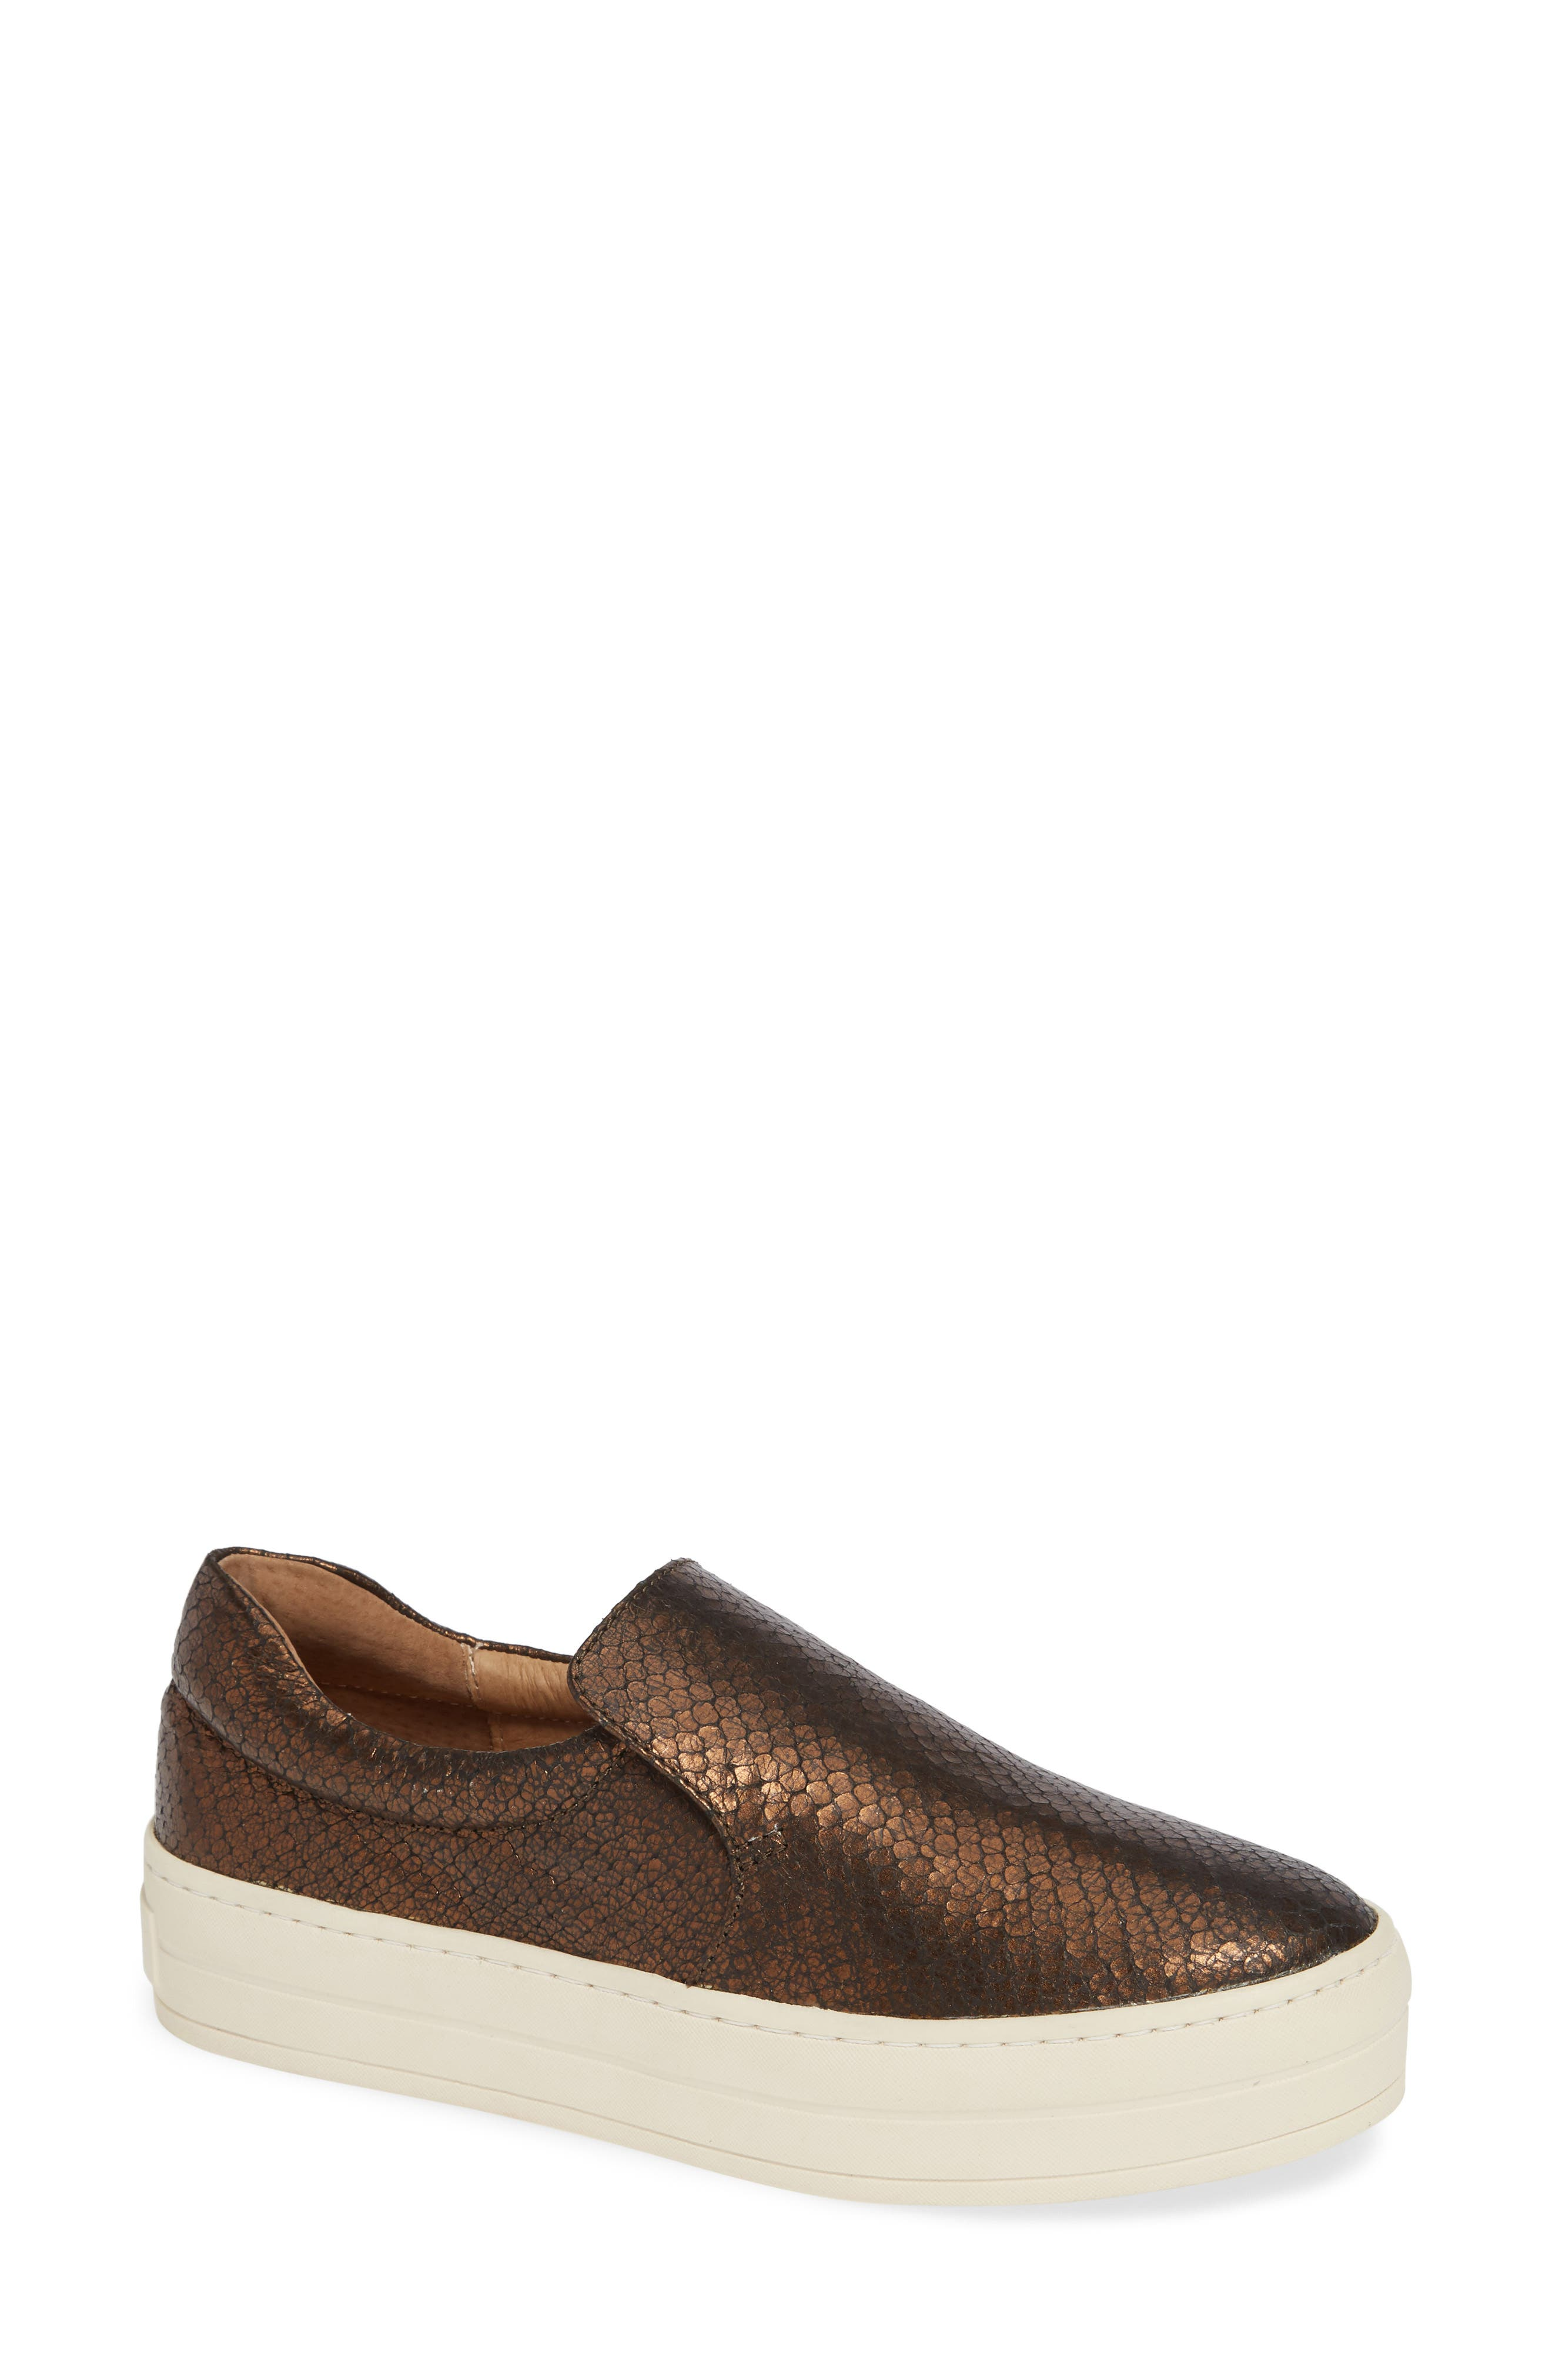 Harry Slip-On Sneaker in Bronze Embossed Leather